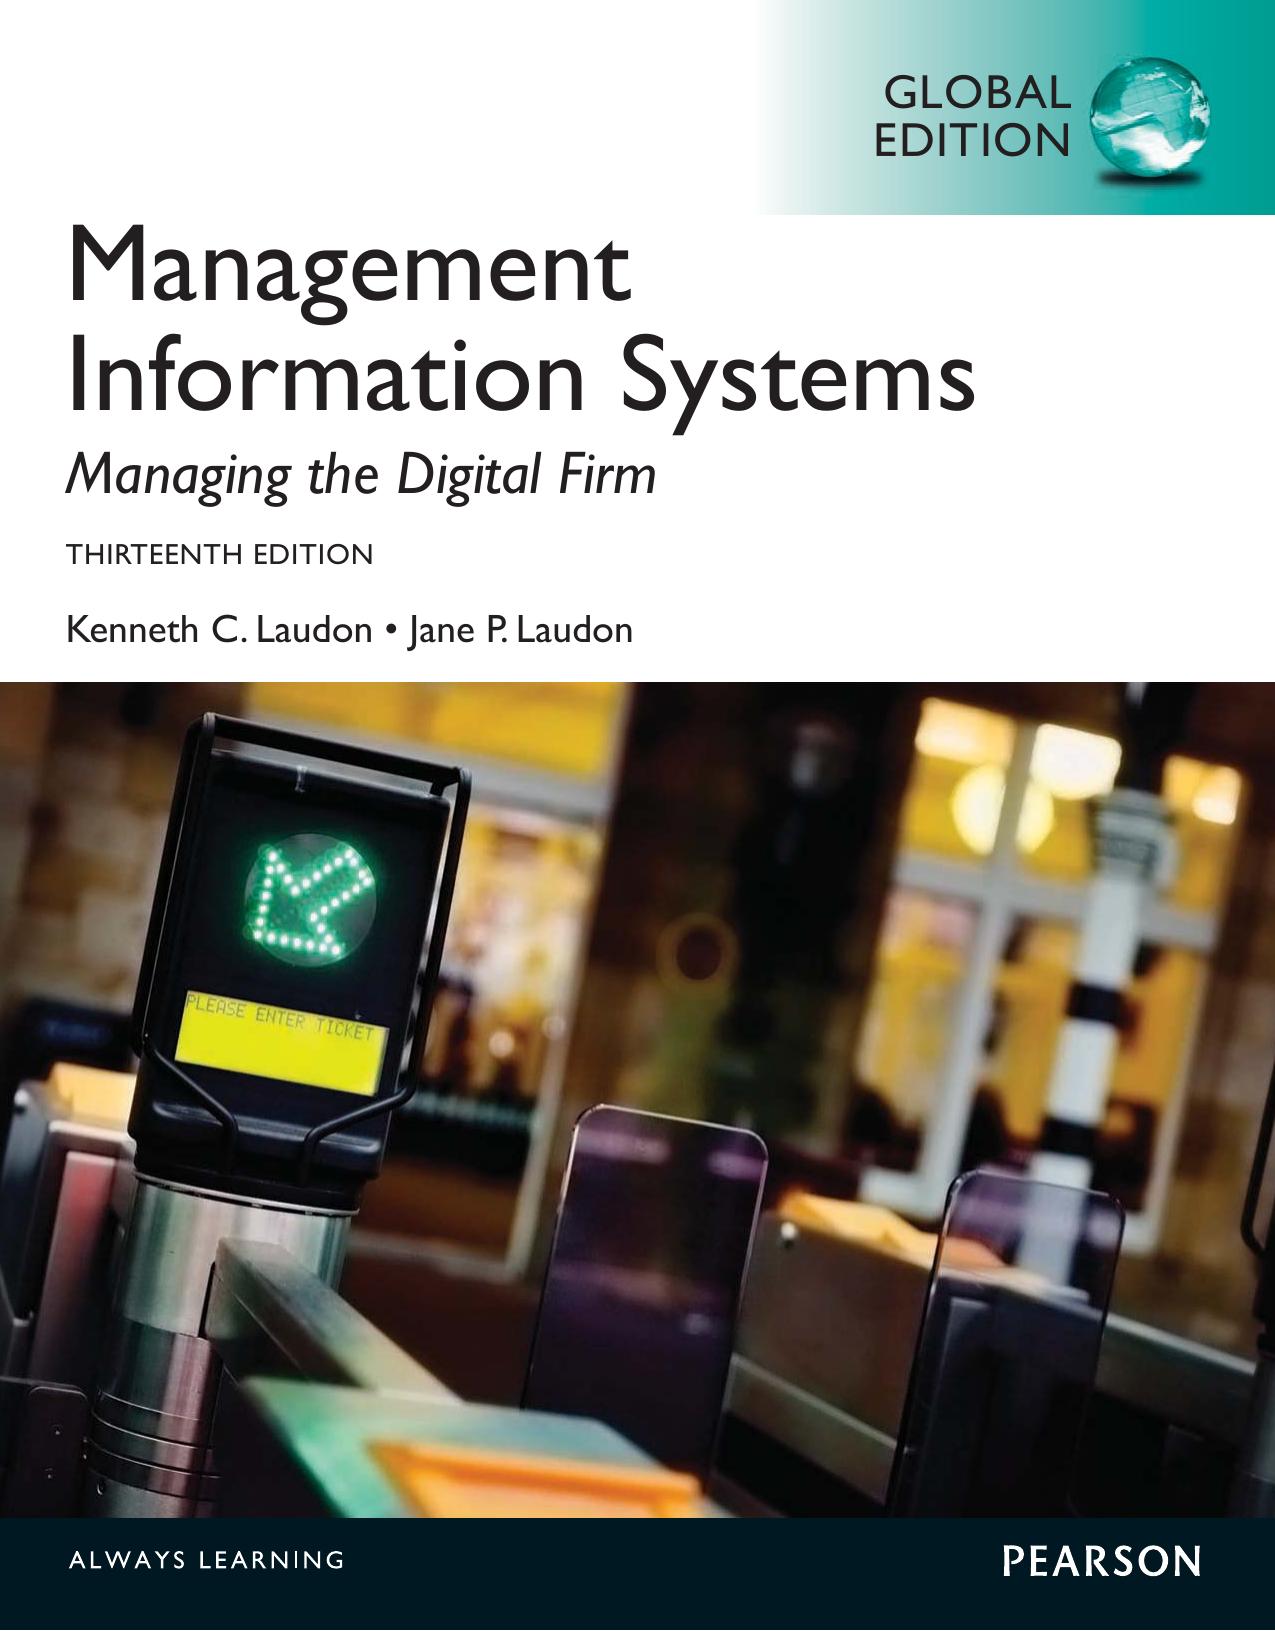 Kenneth C Laudon,Jane P  Laudon - Management Information